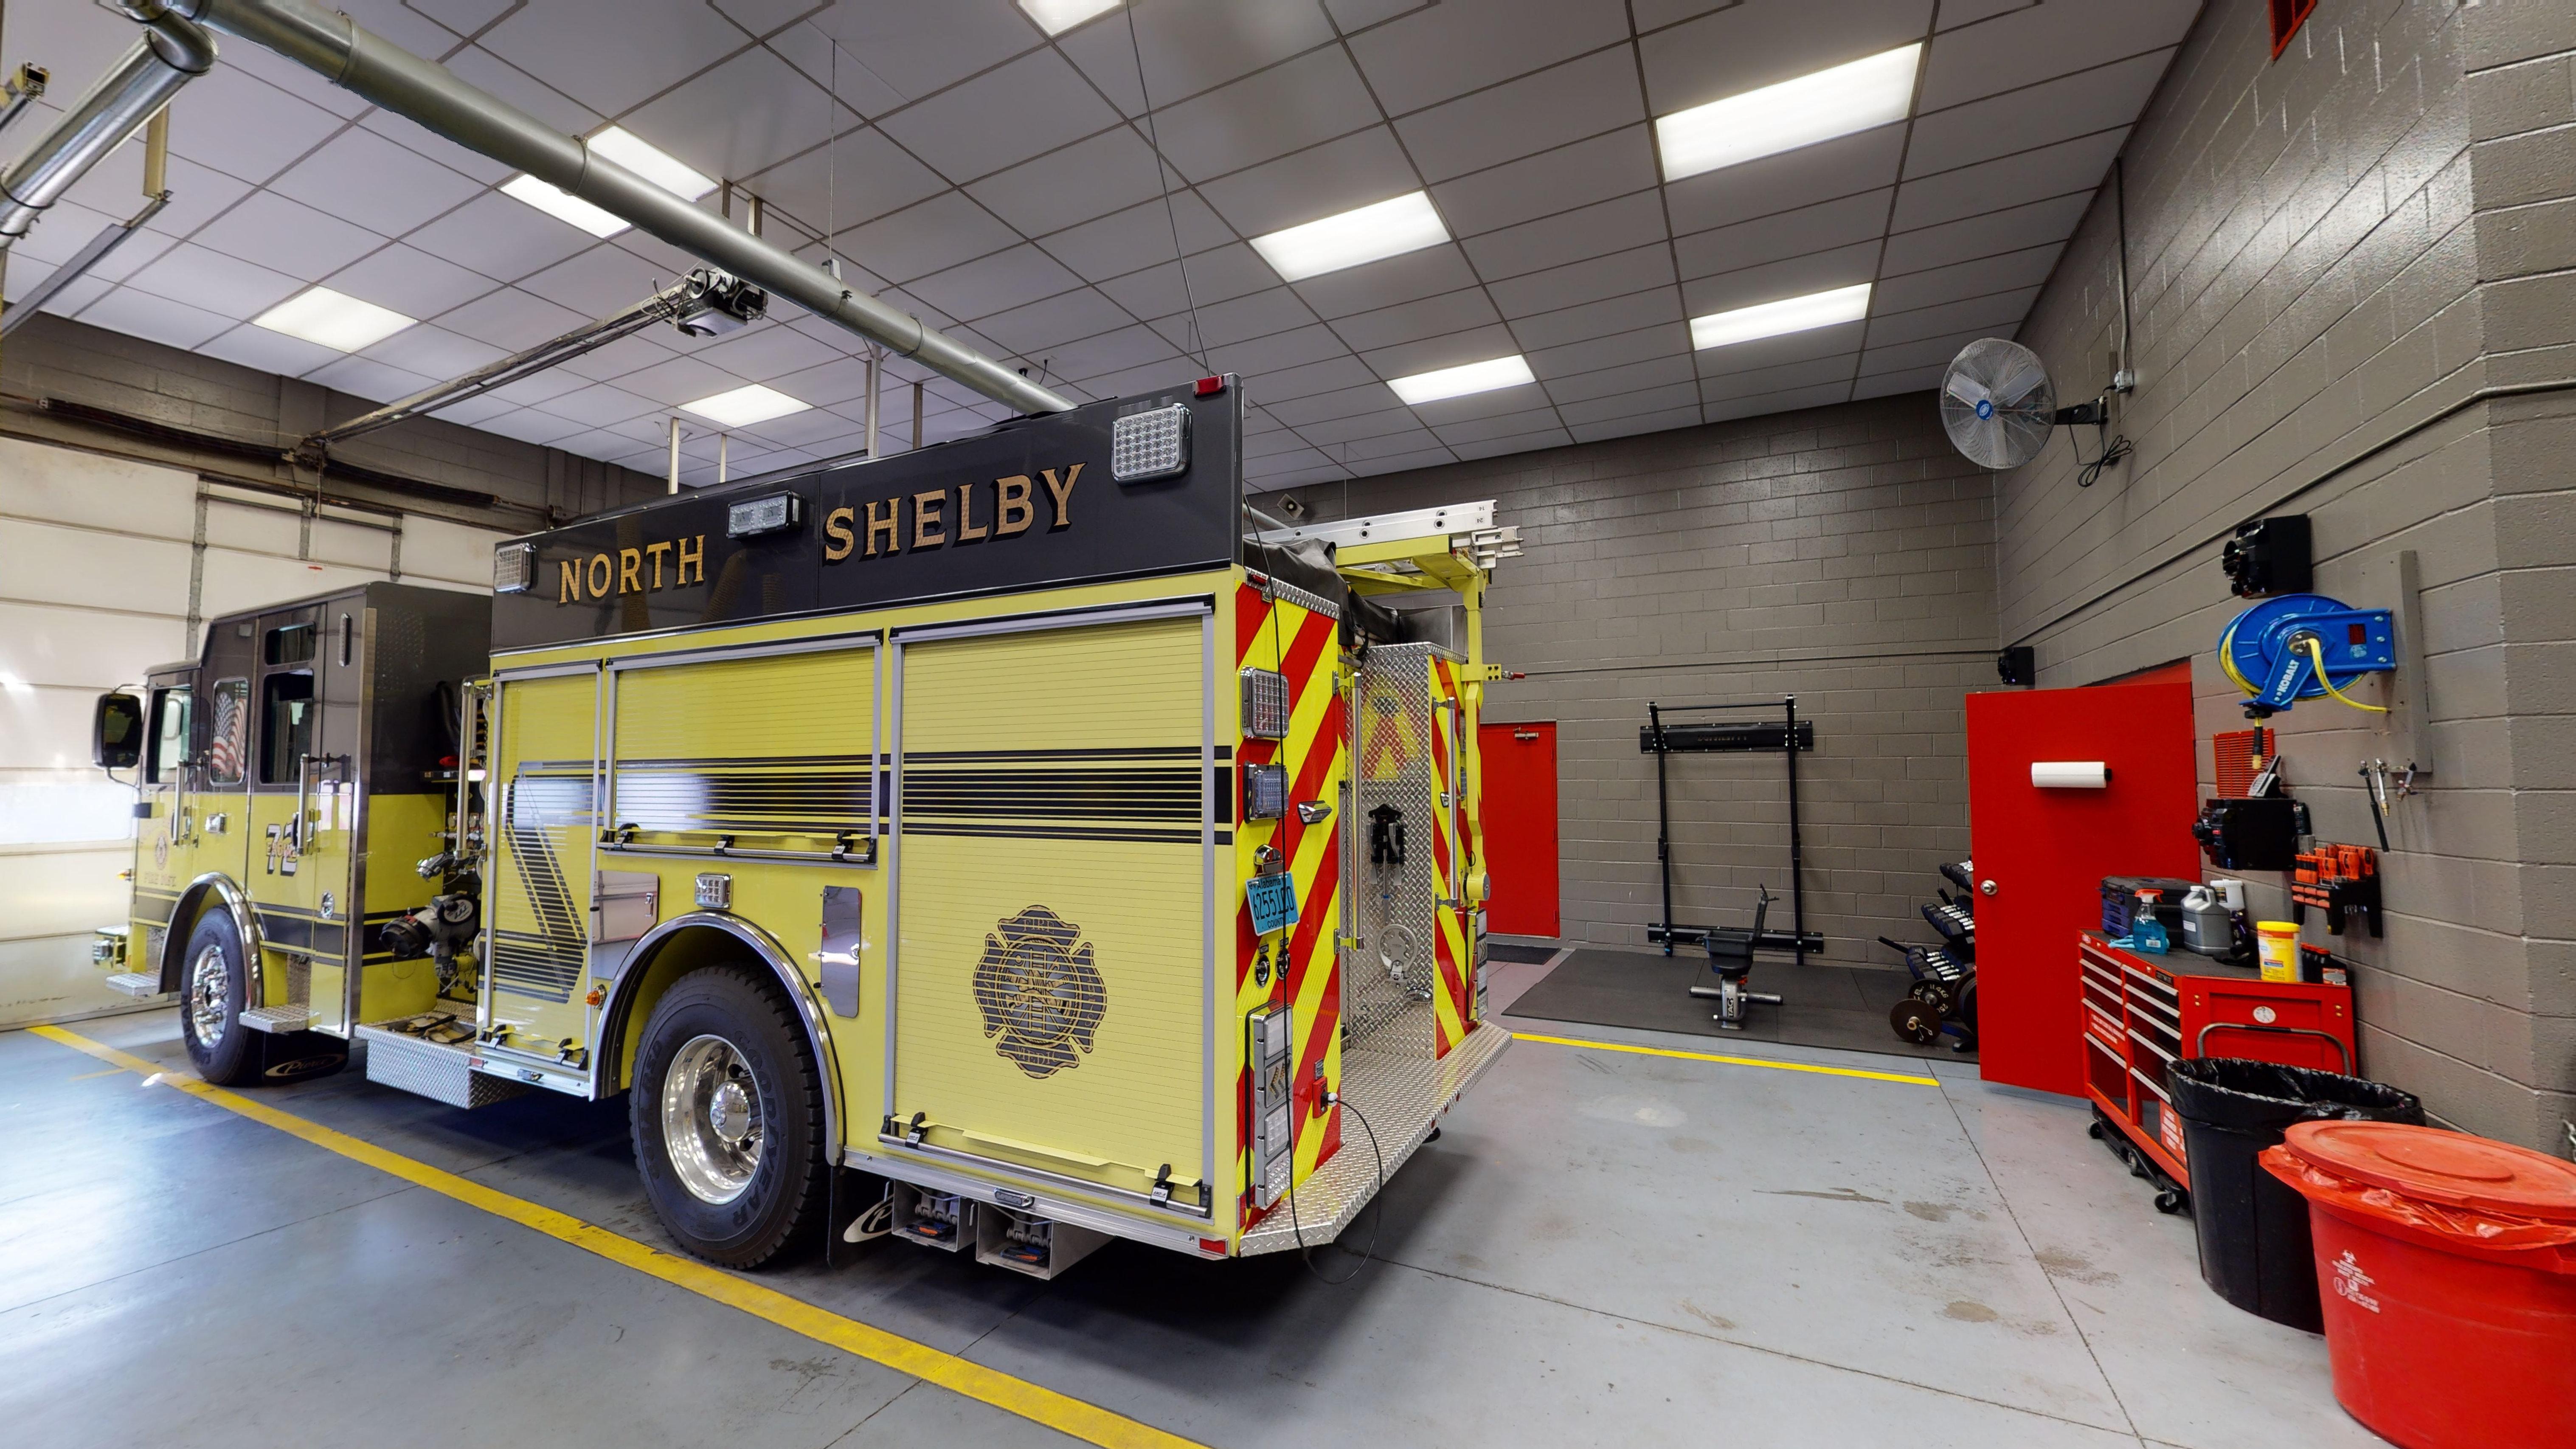 North-Shelby-Fire-District-Saber-custom-pumper-06182021_095914